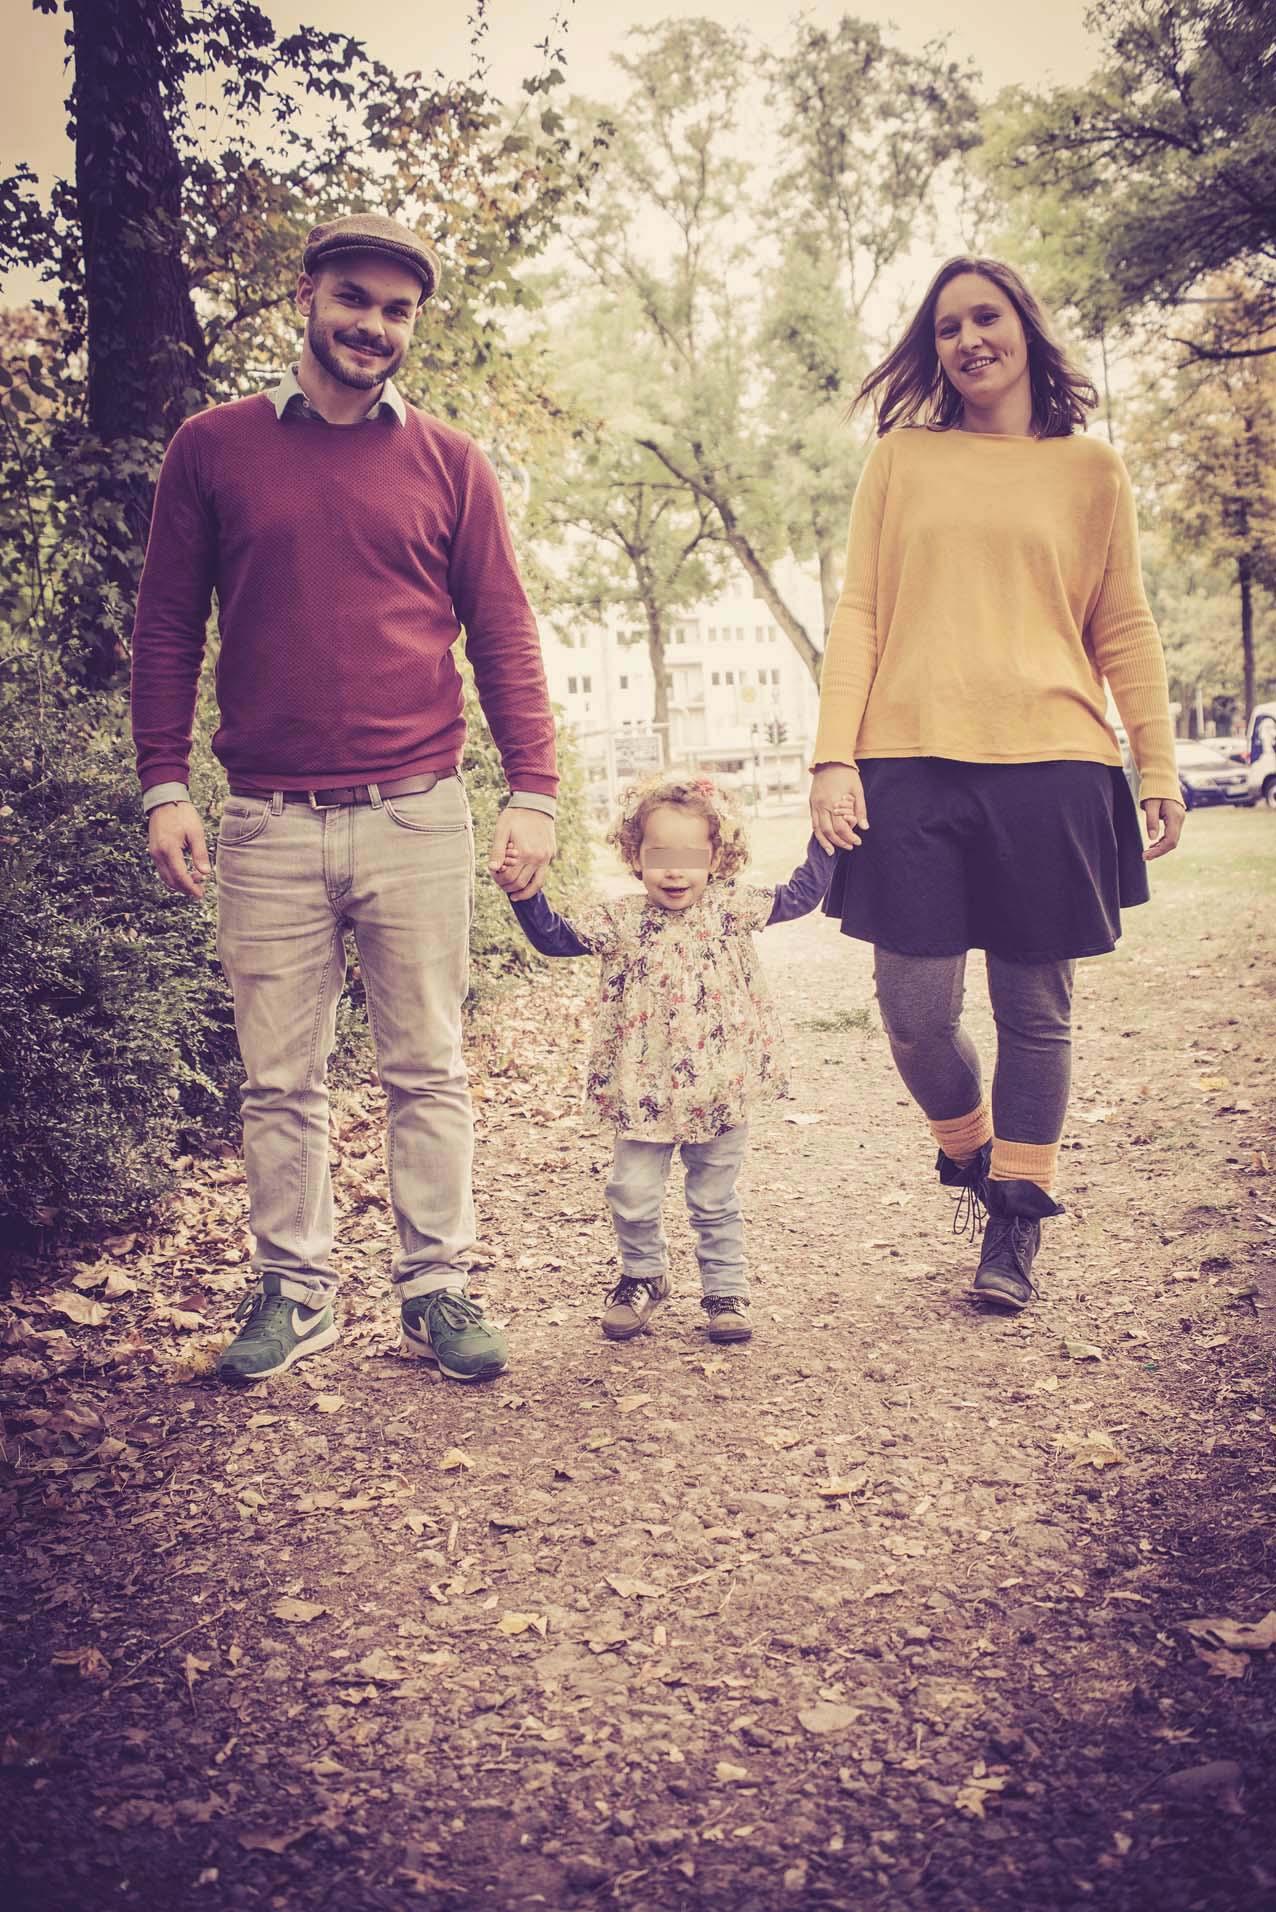 Familienshooting das meschanische auge düsseldorf